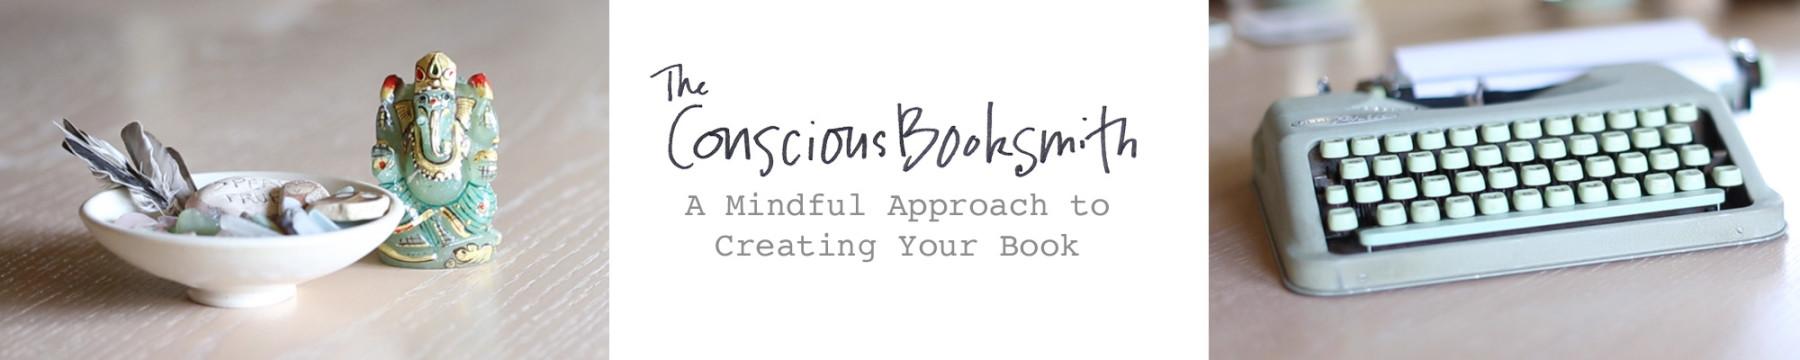 conscious booksmith featured 2 2000x400